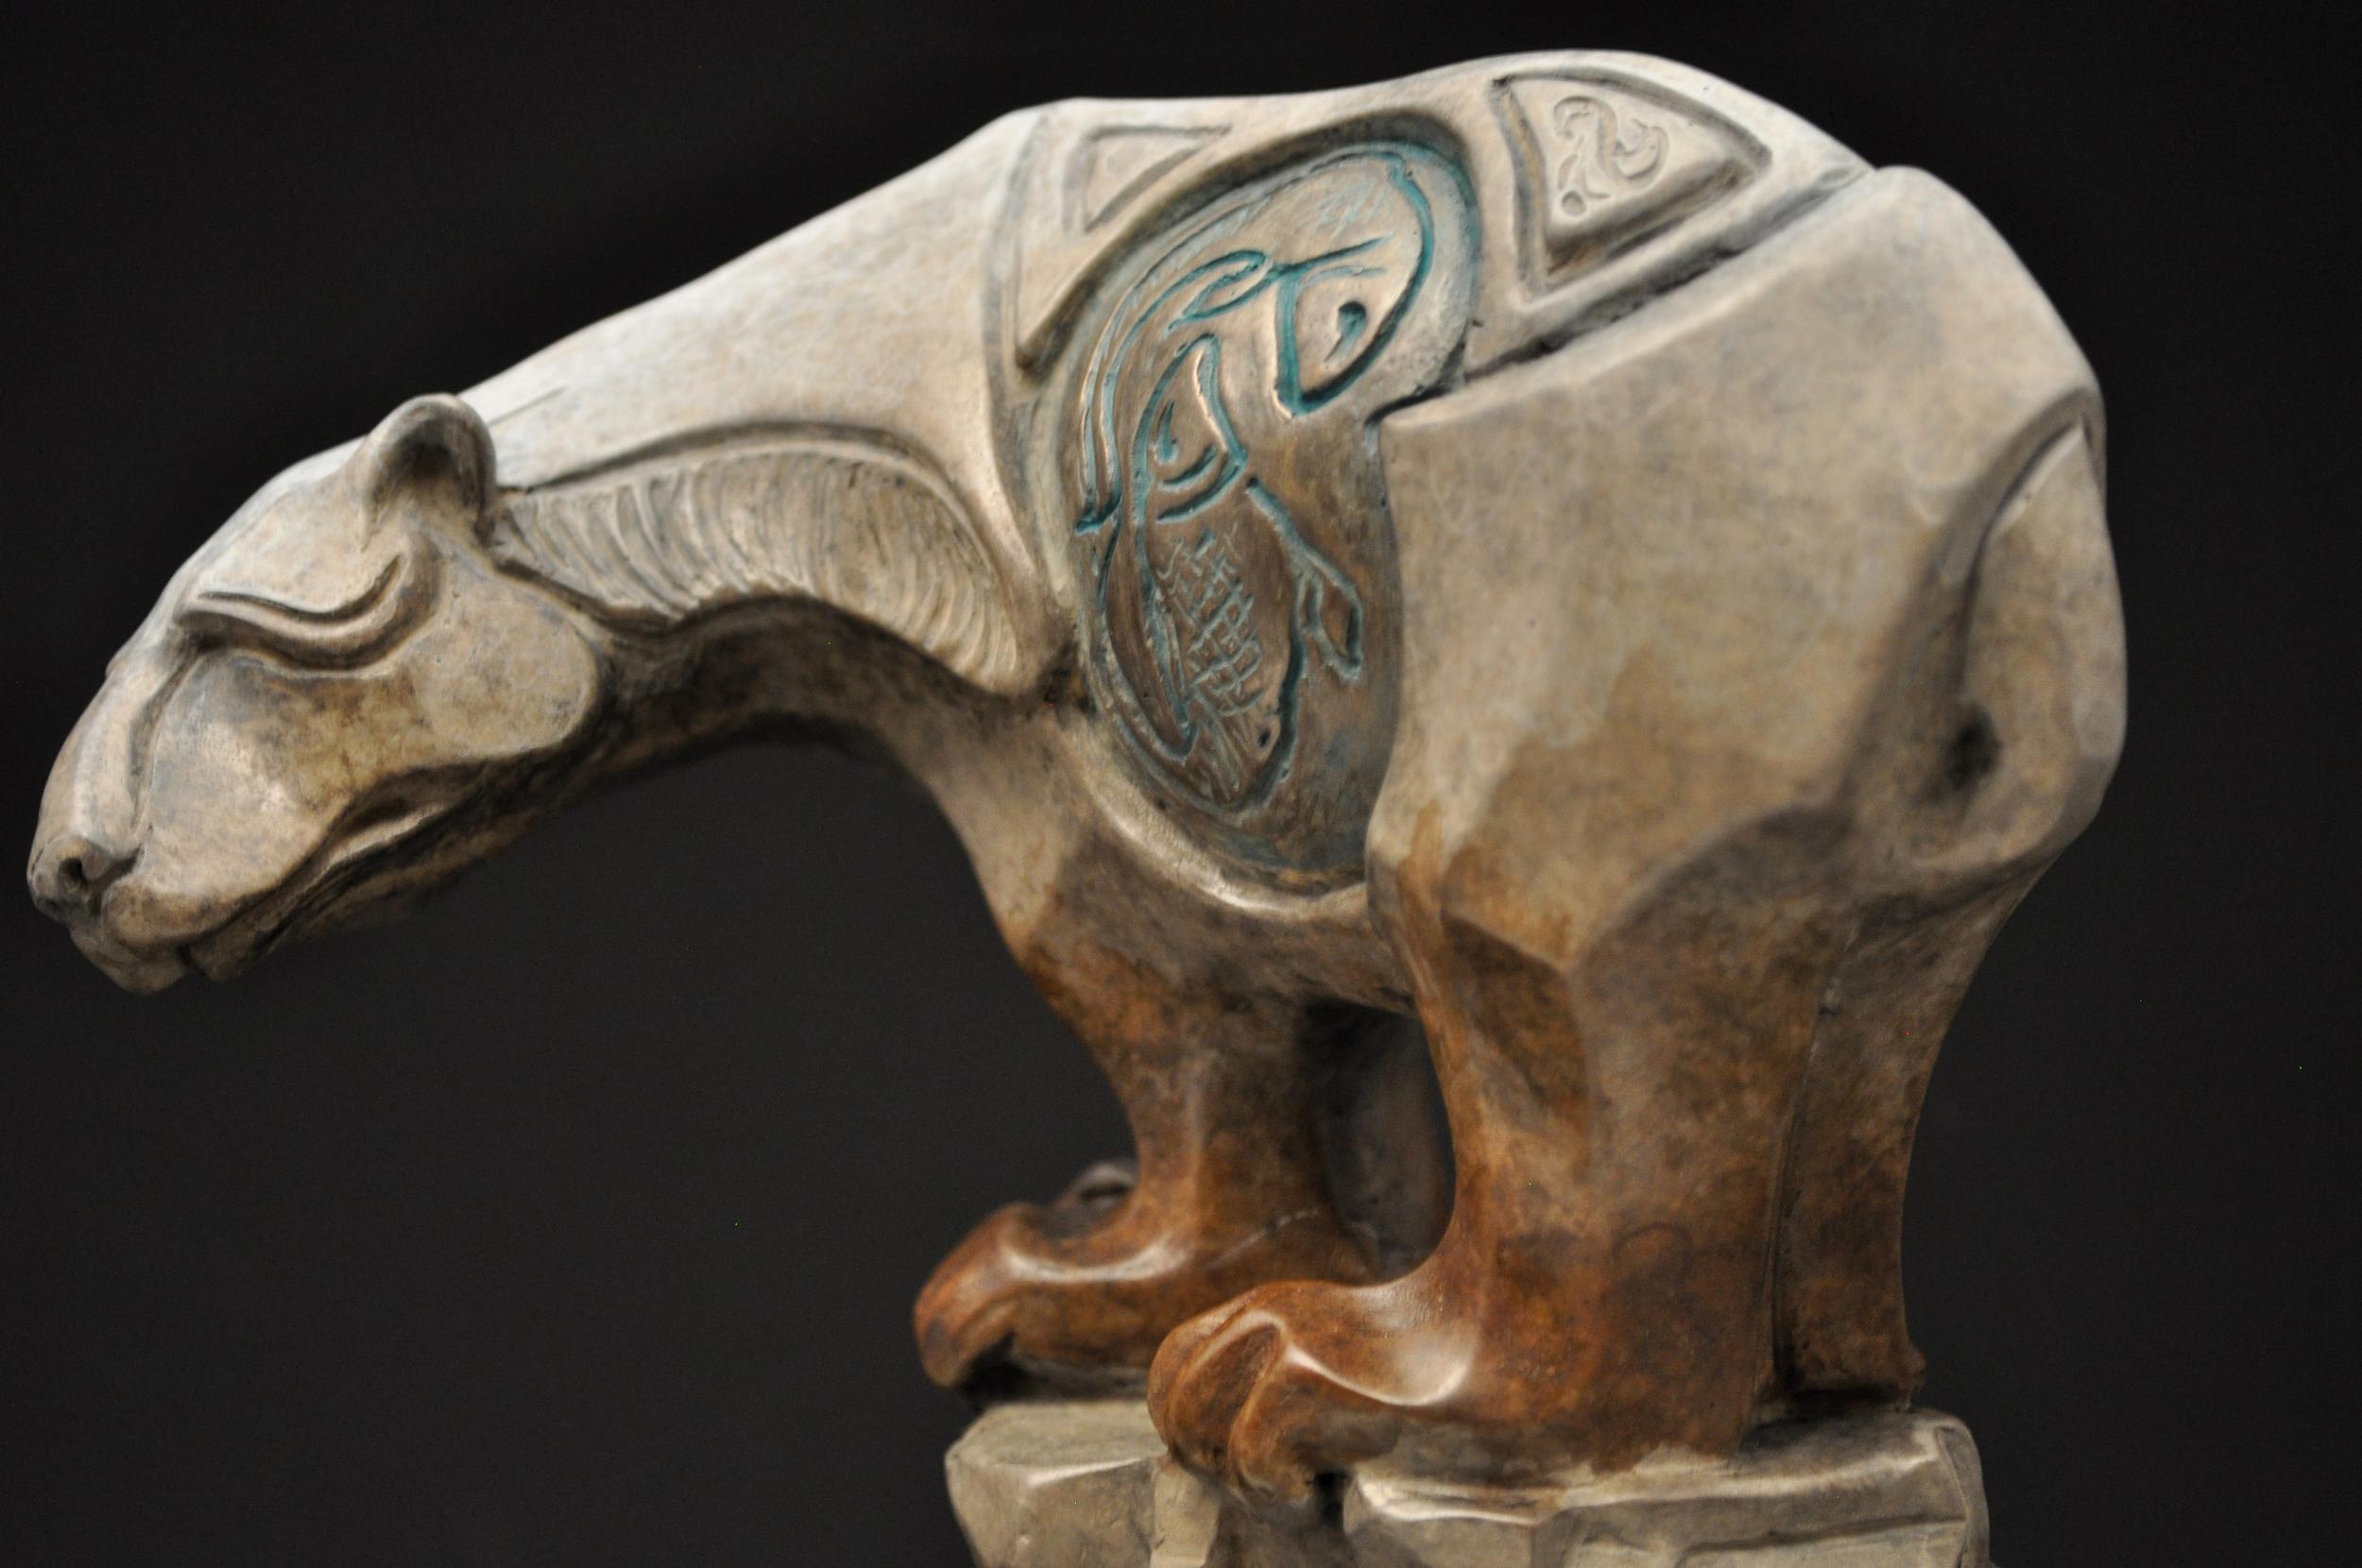 bronze-polar-bear-sculpture-john-maisano-7.jpg